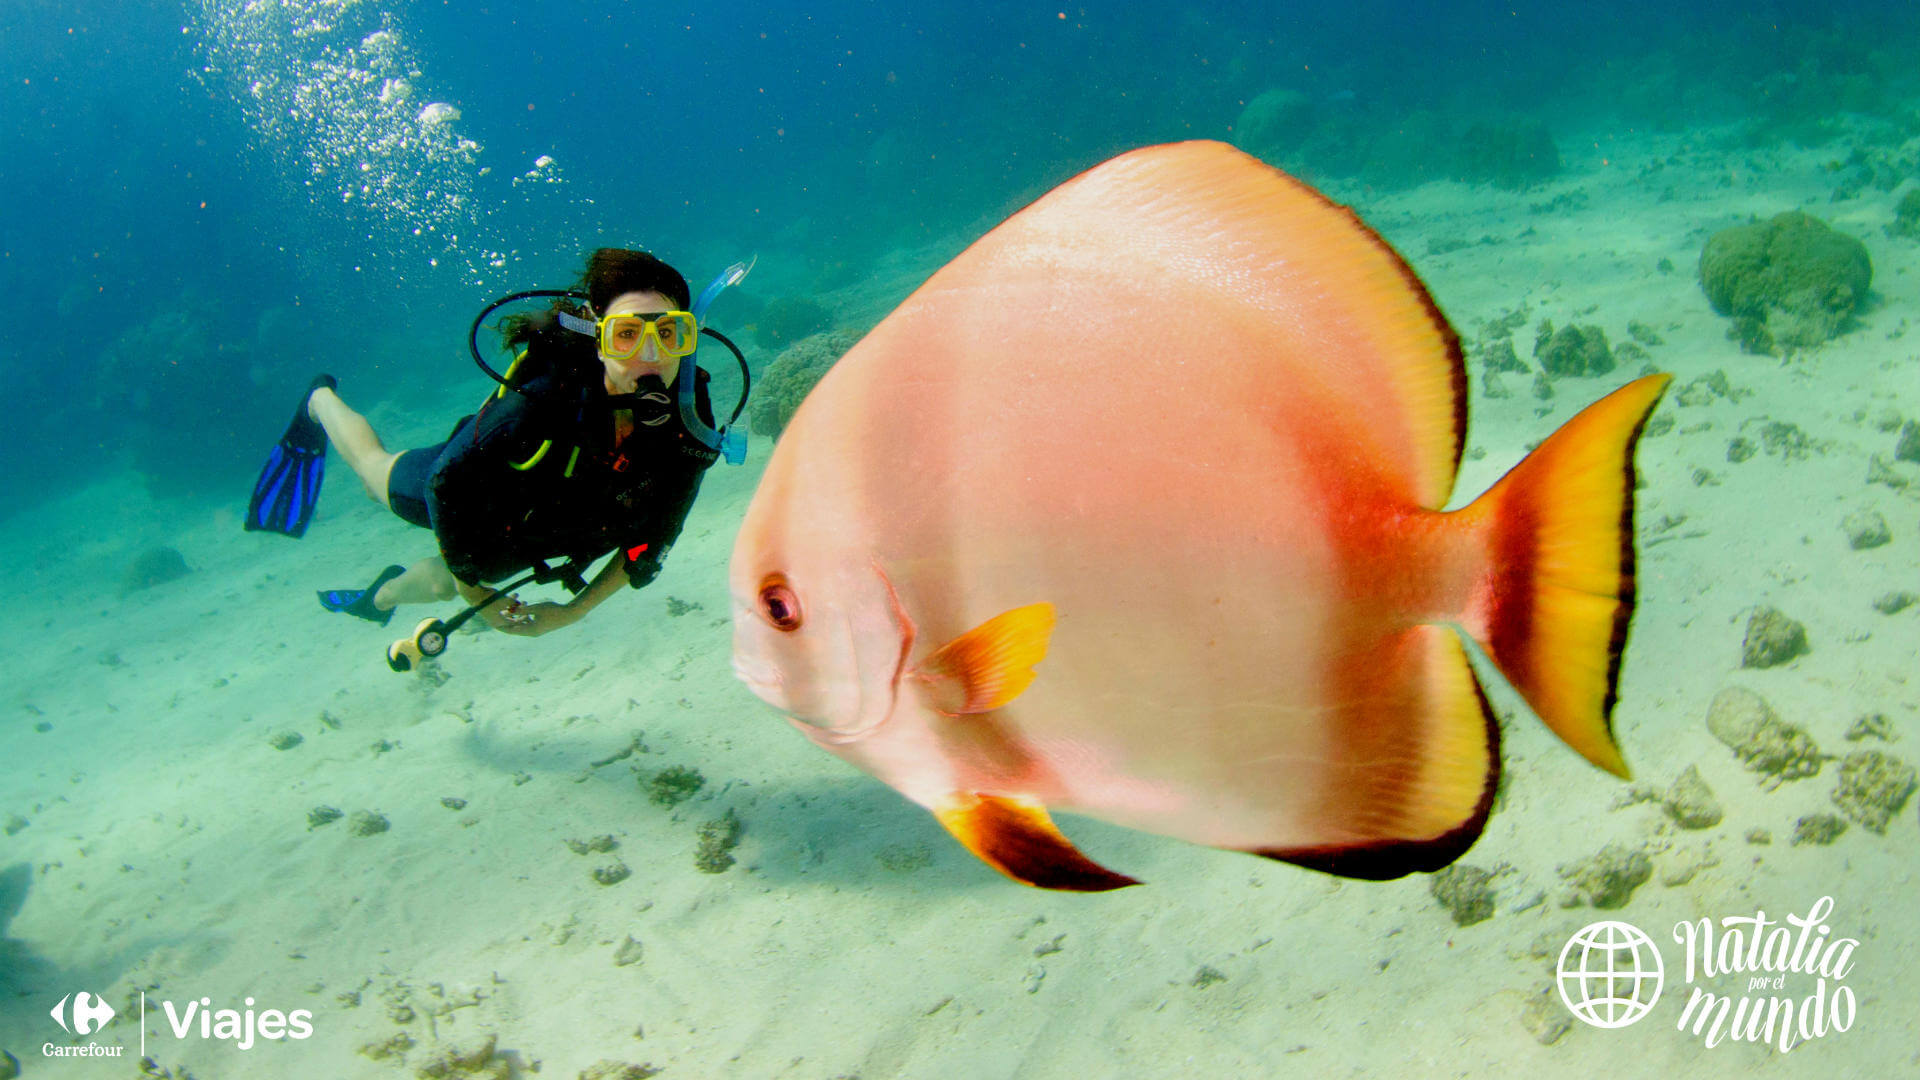 Gran barrera de coral australiana Viajes Carrefour 17 1